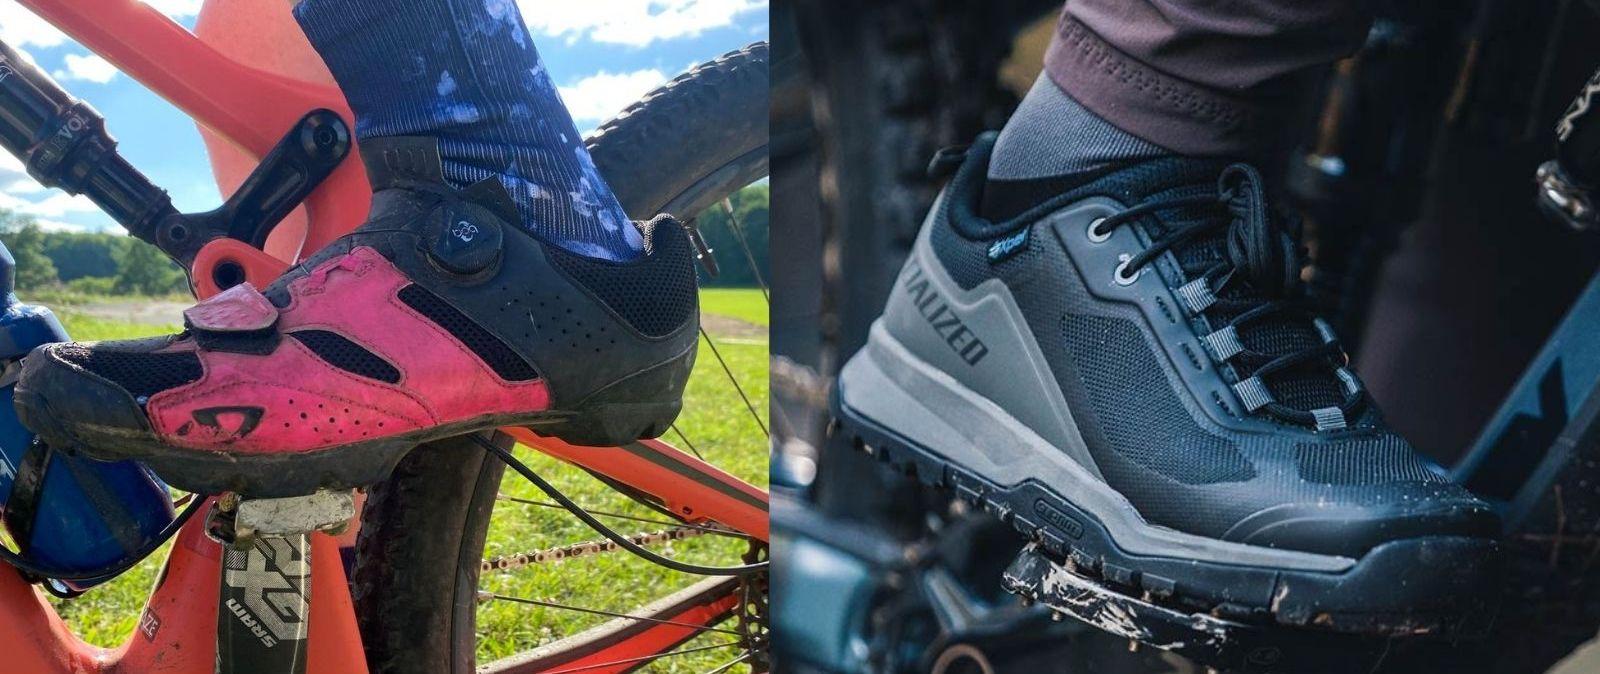 Best mountain bike shoe: clipless on left, flat on right